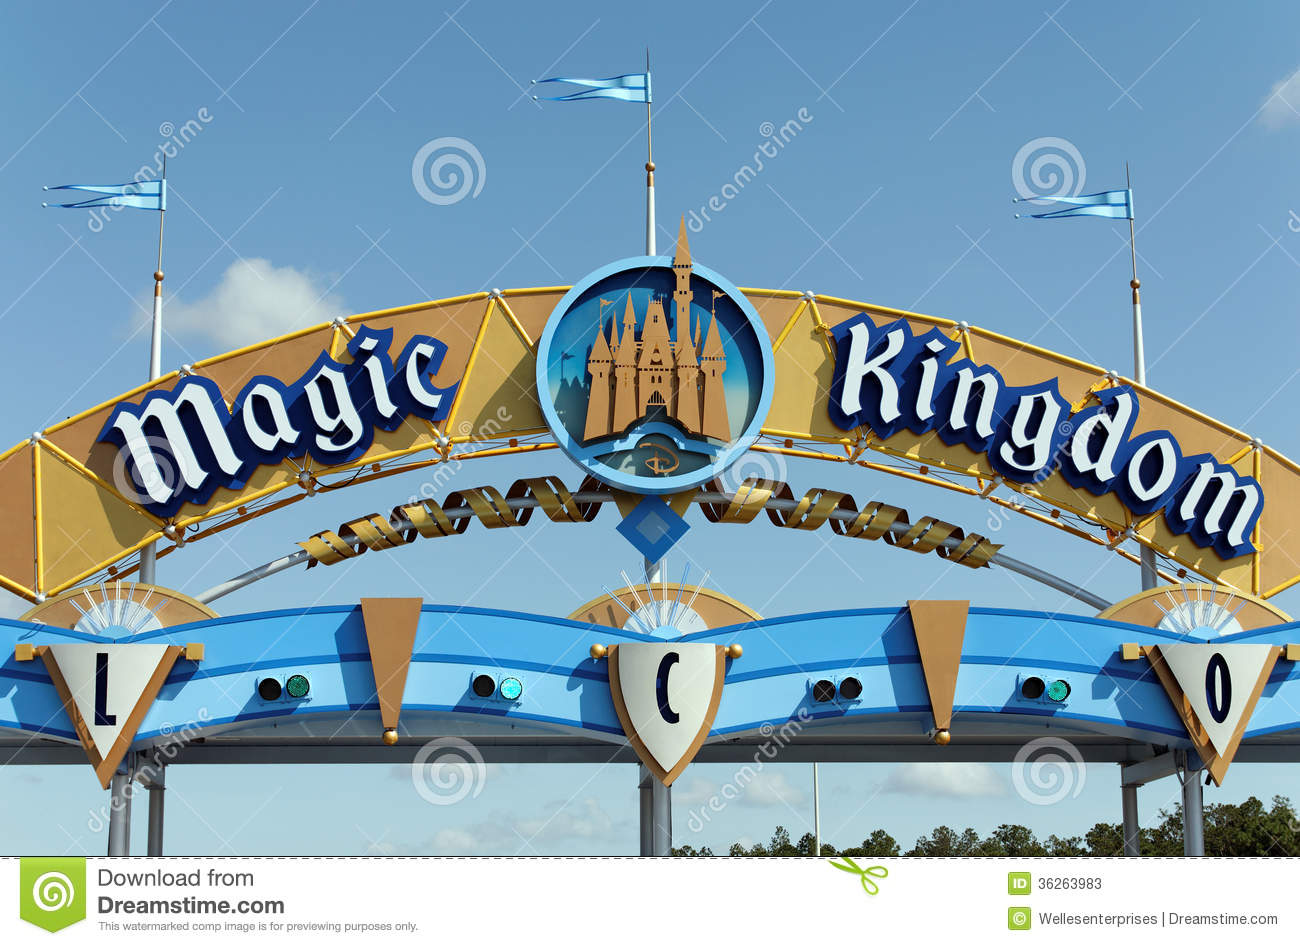 Magic kingdom disney world clipart banner freeuse download Disney World Magic Kingdom Clipart - Clipart Kid banner freeuse download